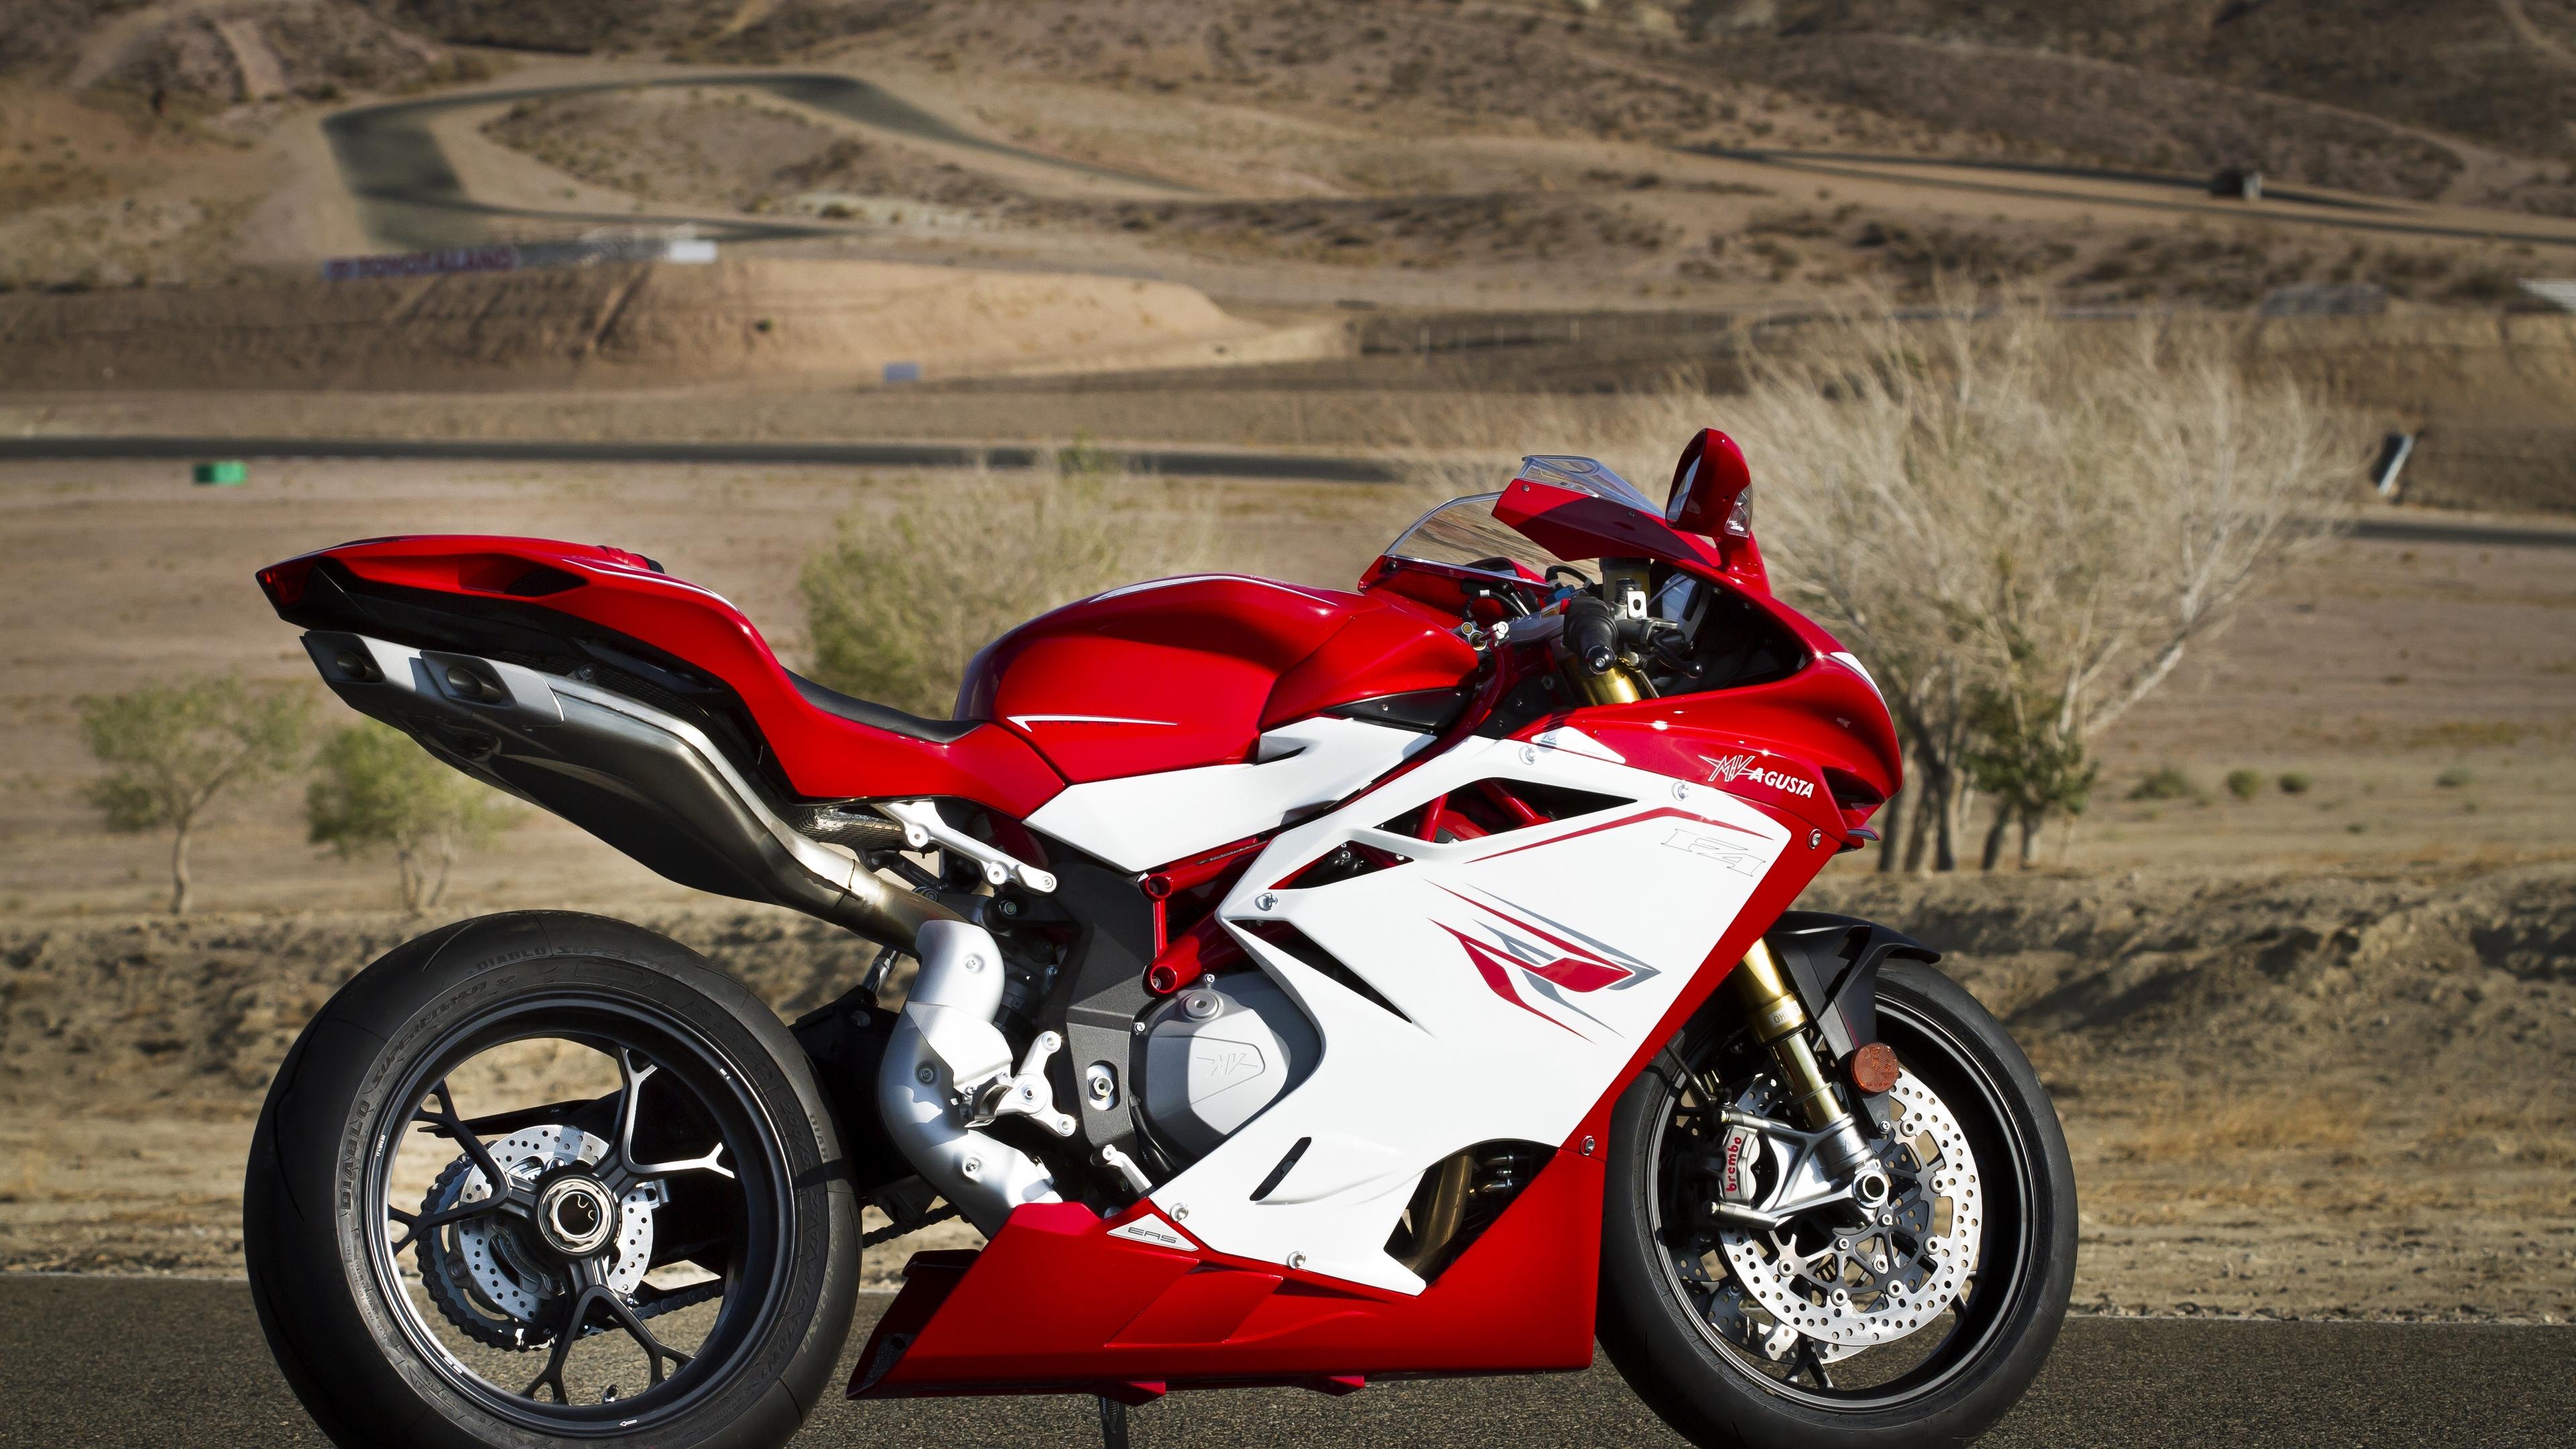 mv agusta f4 motorcycle side red 4k 1536018381 - mv agusta, f4, motorcycle, side, red 4k - mv agusta, Motorcycle, f4